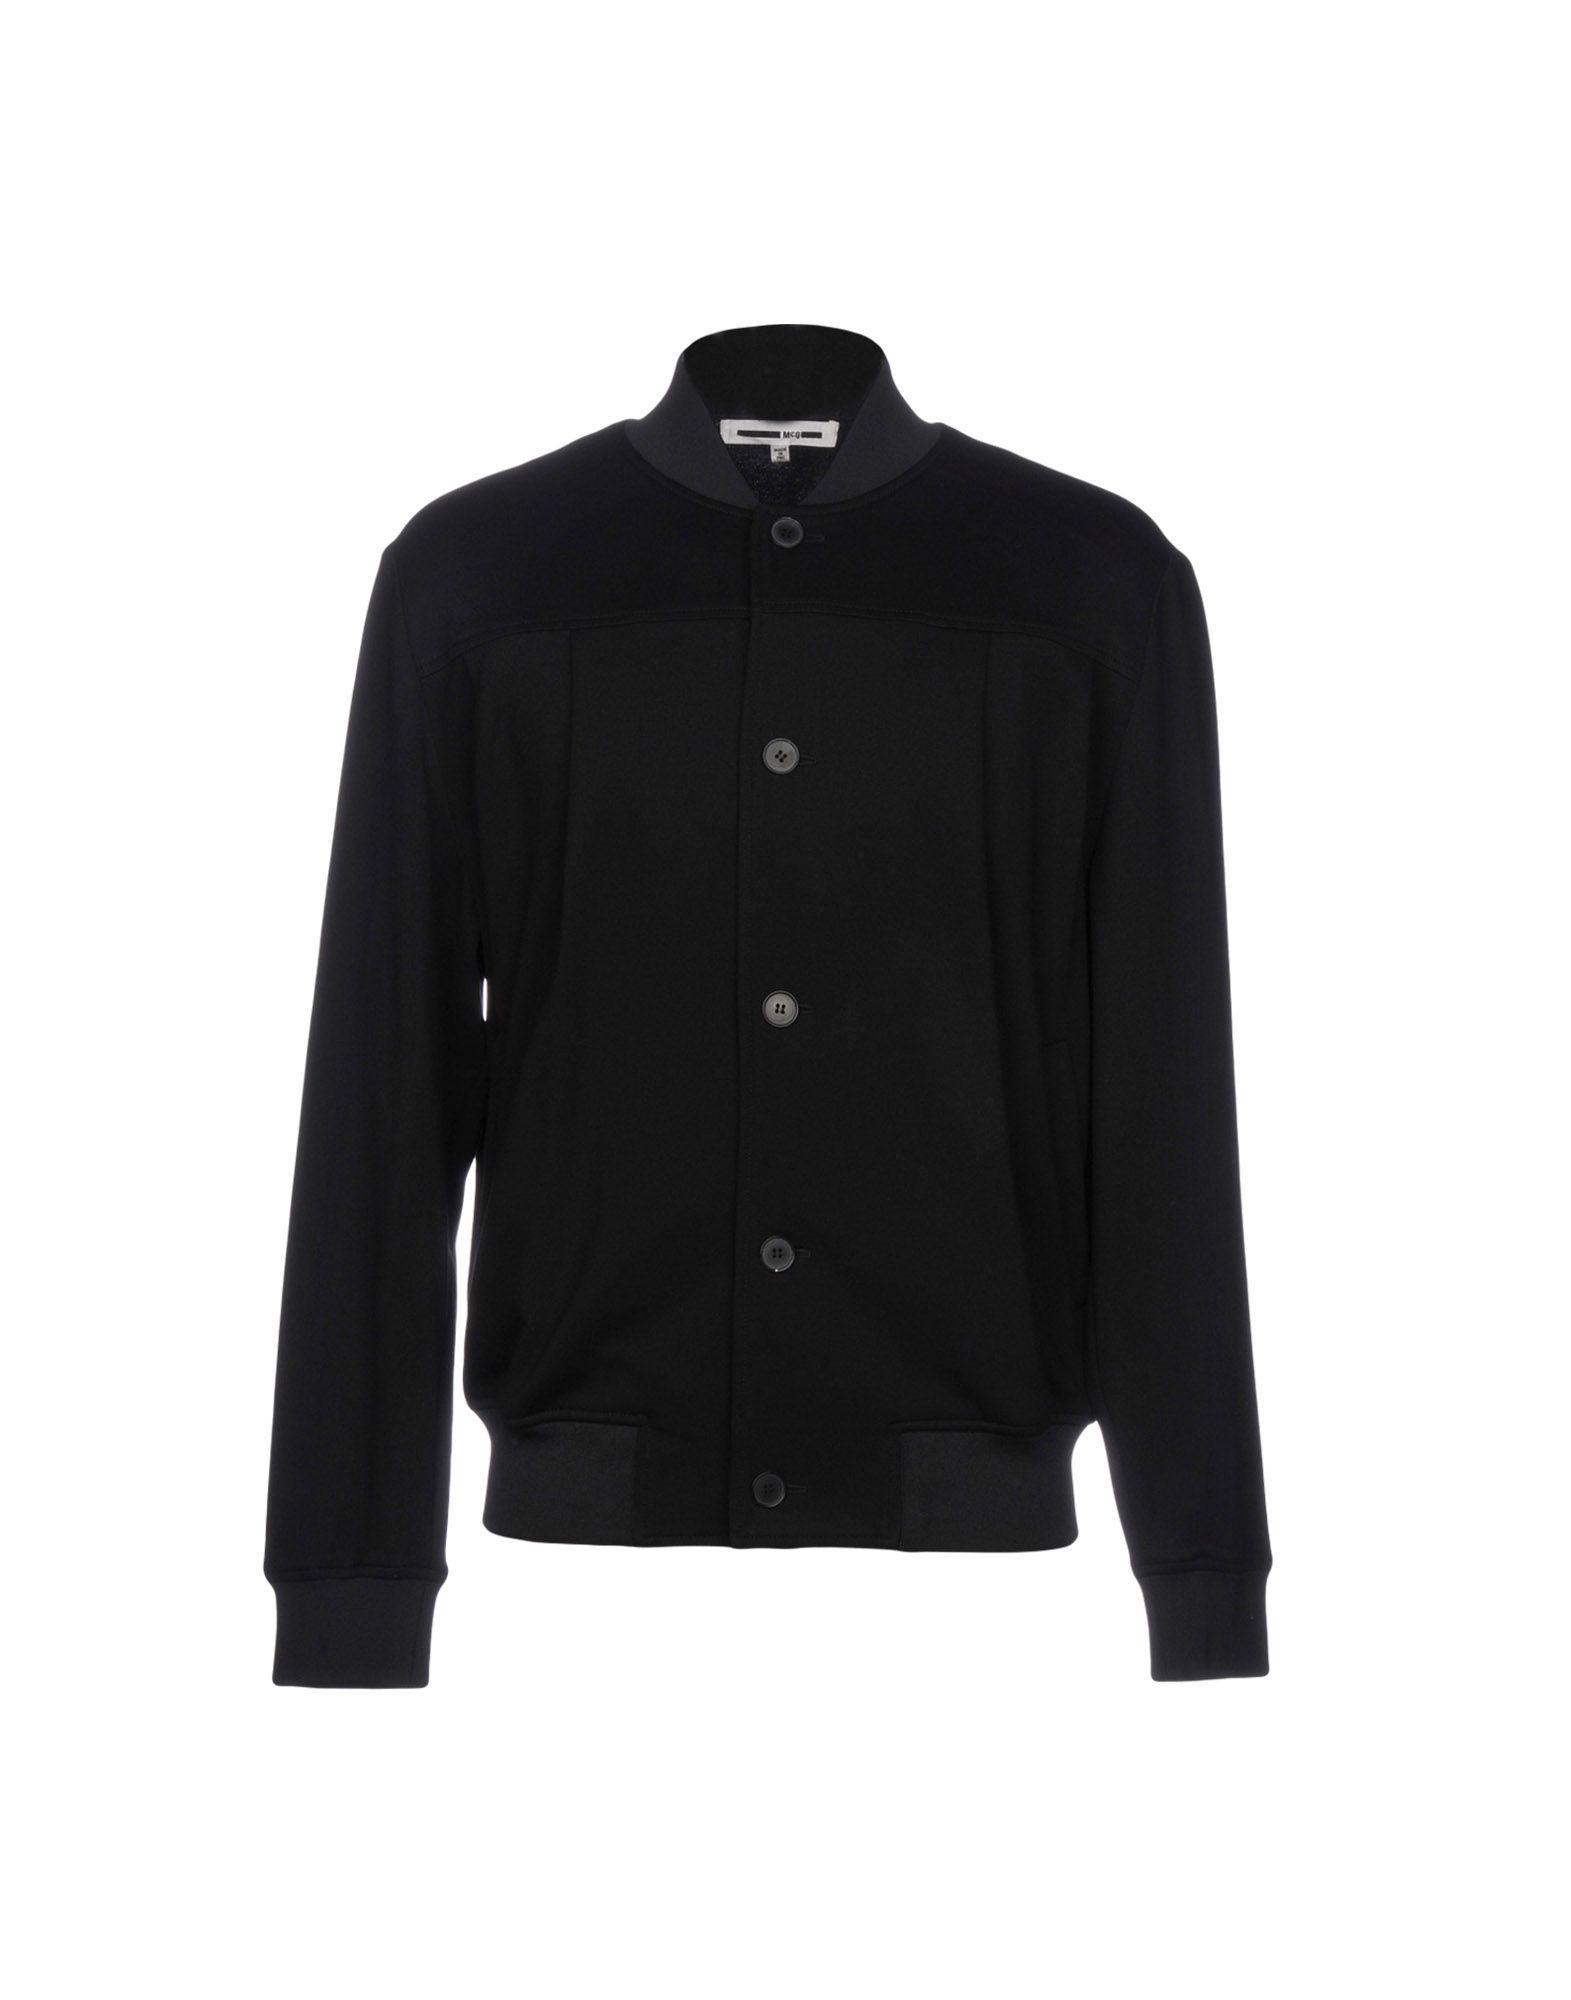 Mcq By Alexander Mcqueen Jackets In Black